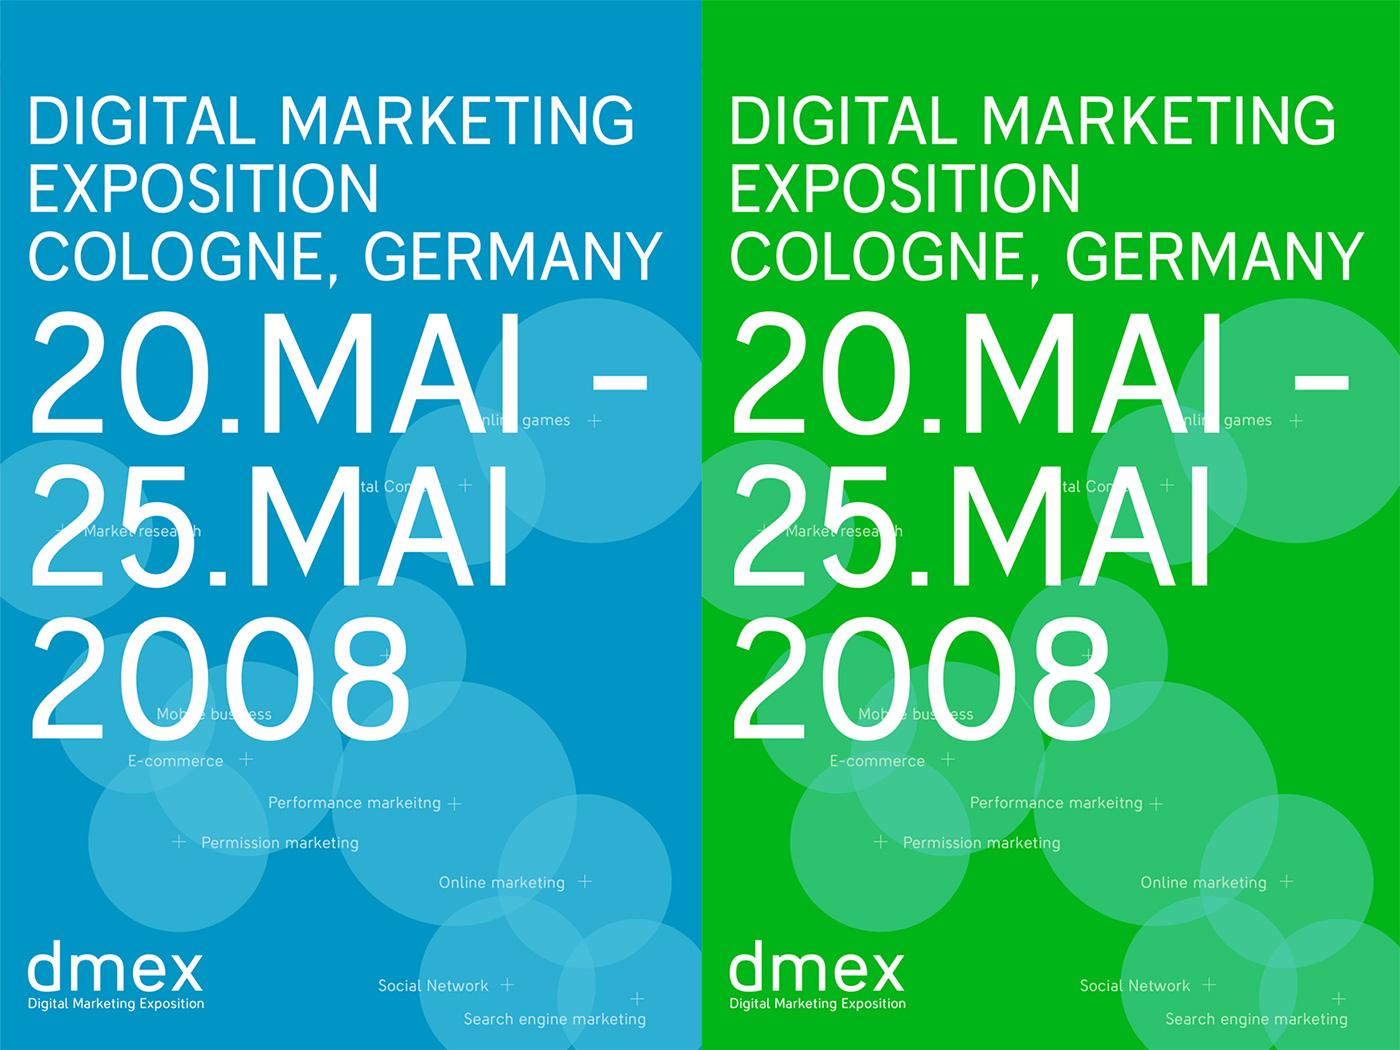 dmex11